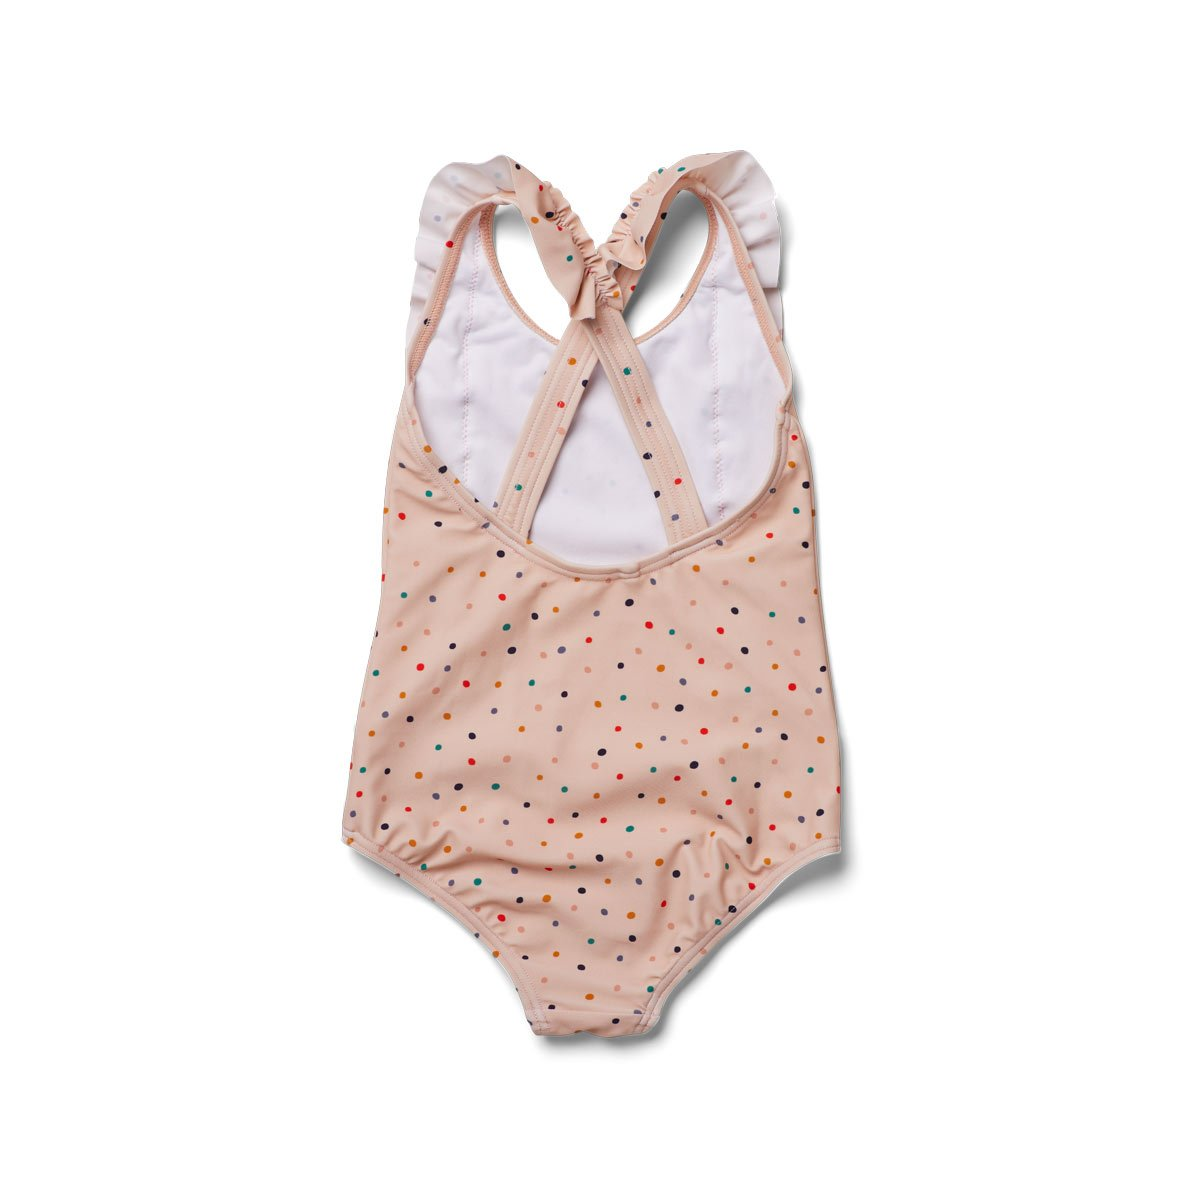 Liewood - Moa Swimsuit Confetti mix